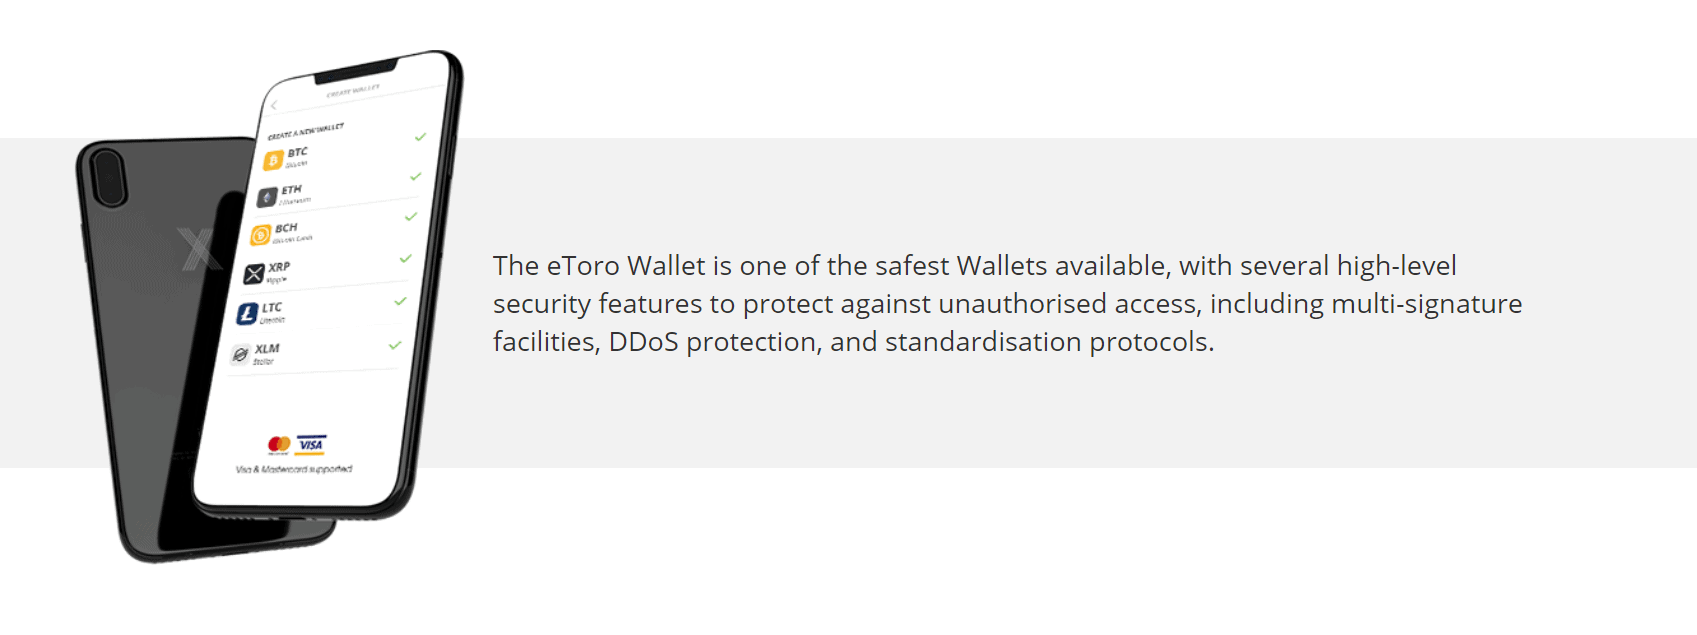 etoro wallet security